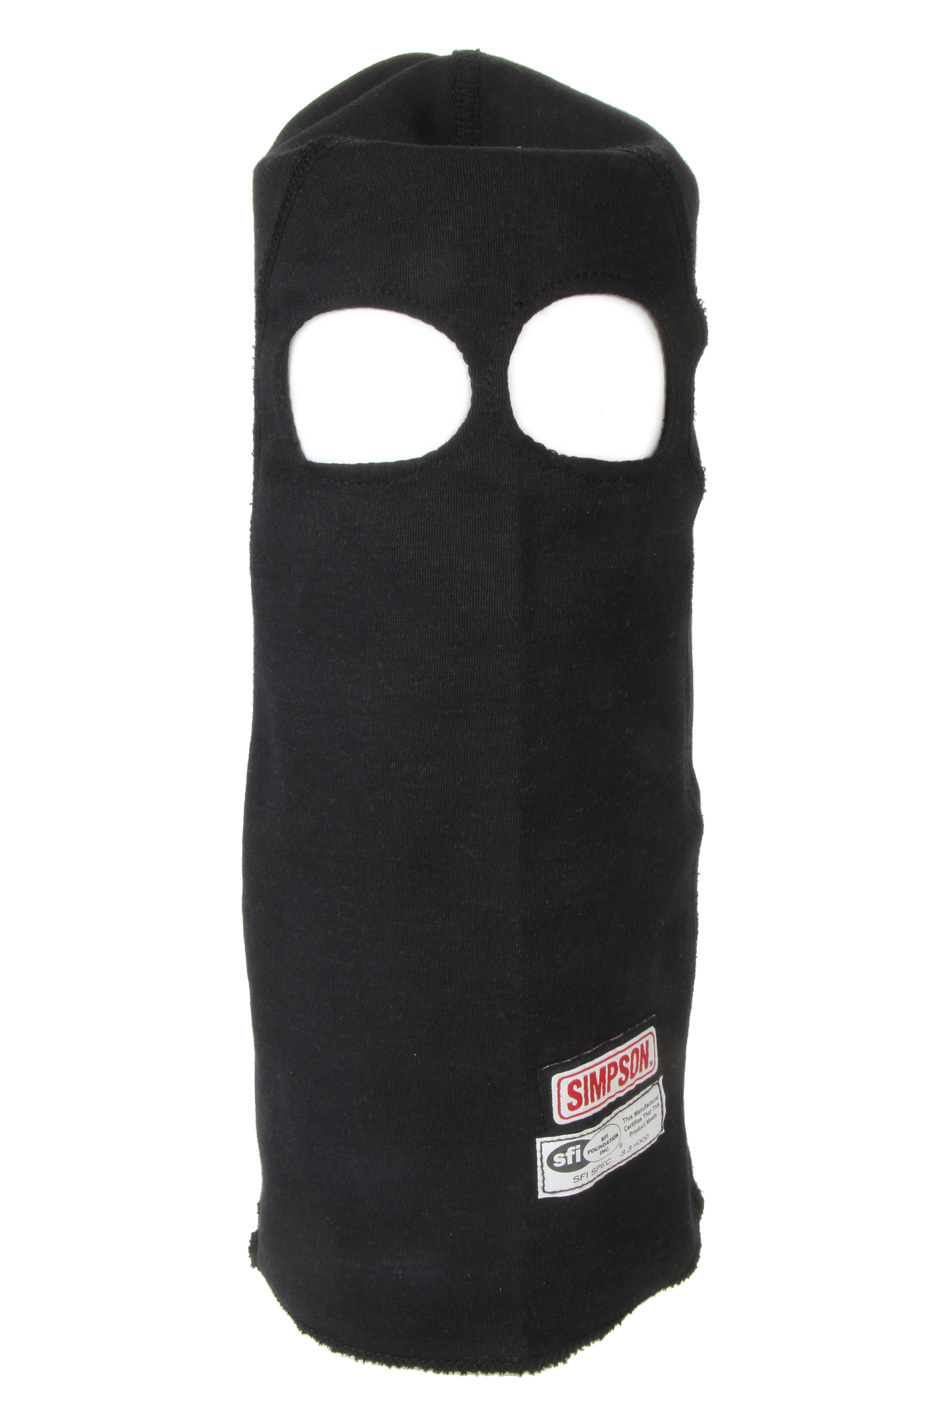 Simpson Safety Nomex Head Sock Black Dual Eyeport